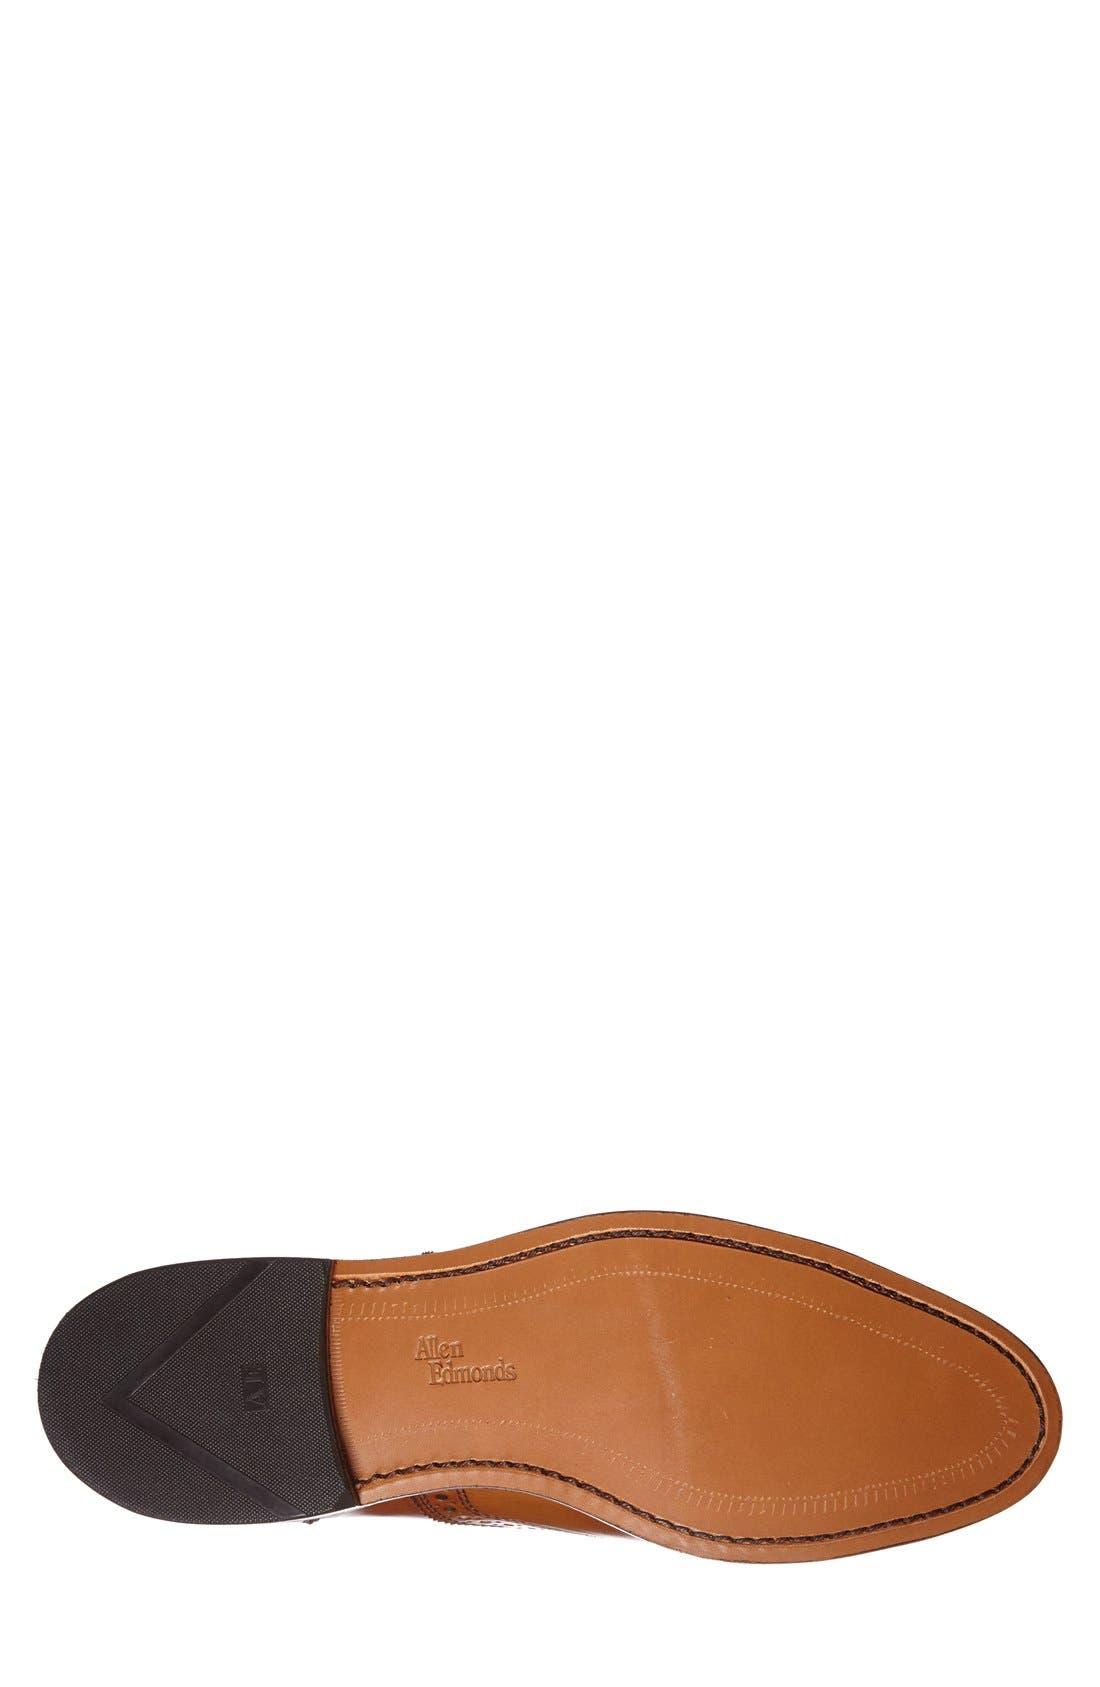 'Strand' Cap Toe Oxford,                             Alternate thumbnail 4, color,                             Walnut Leather